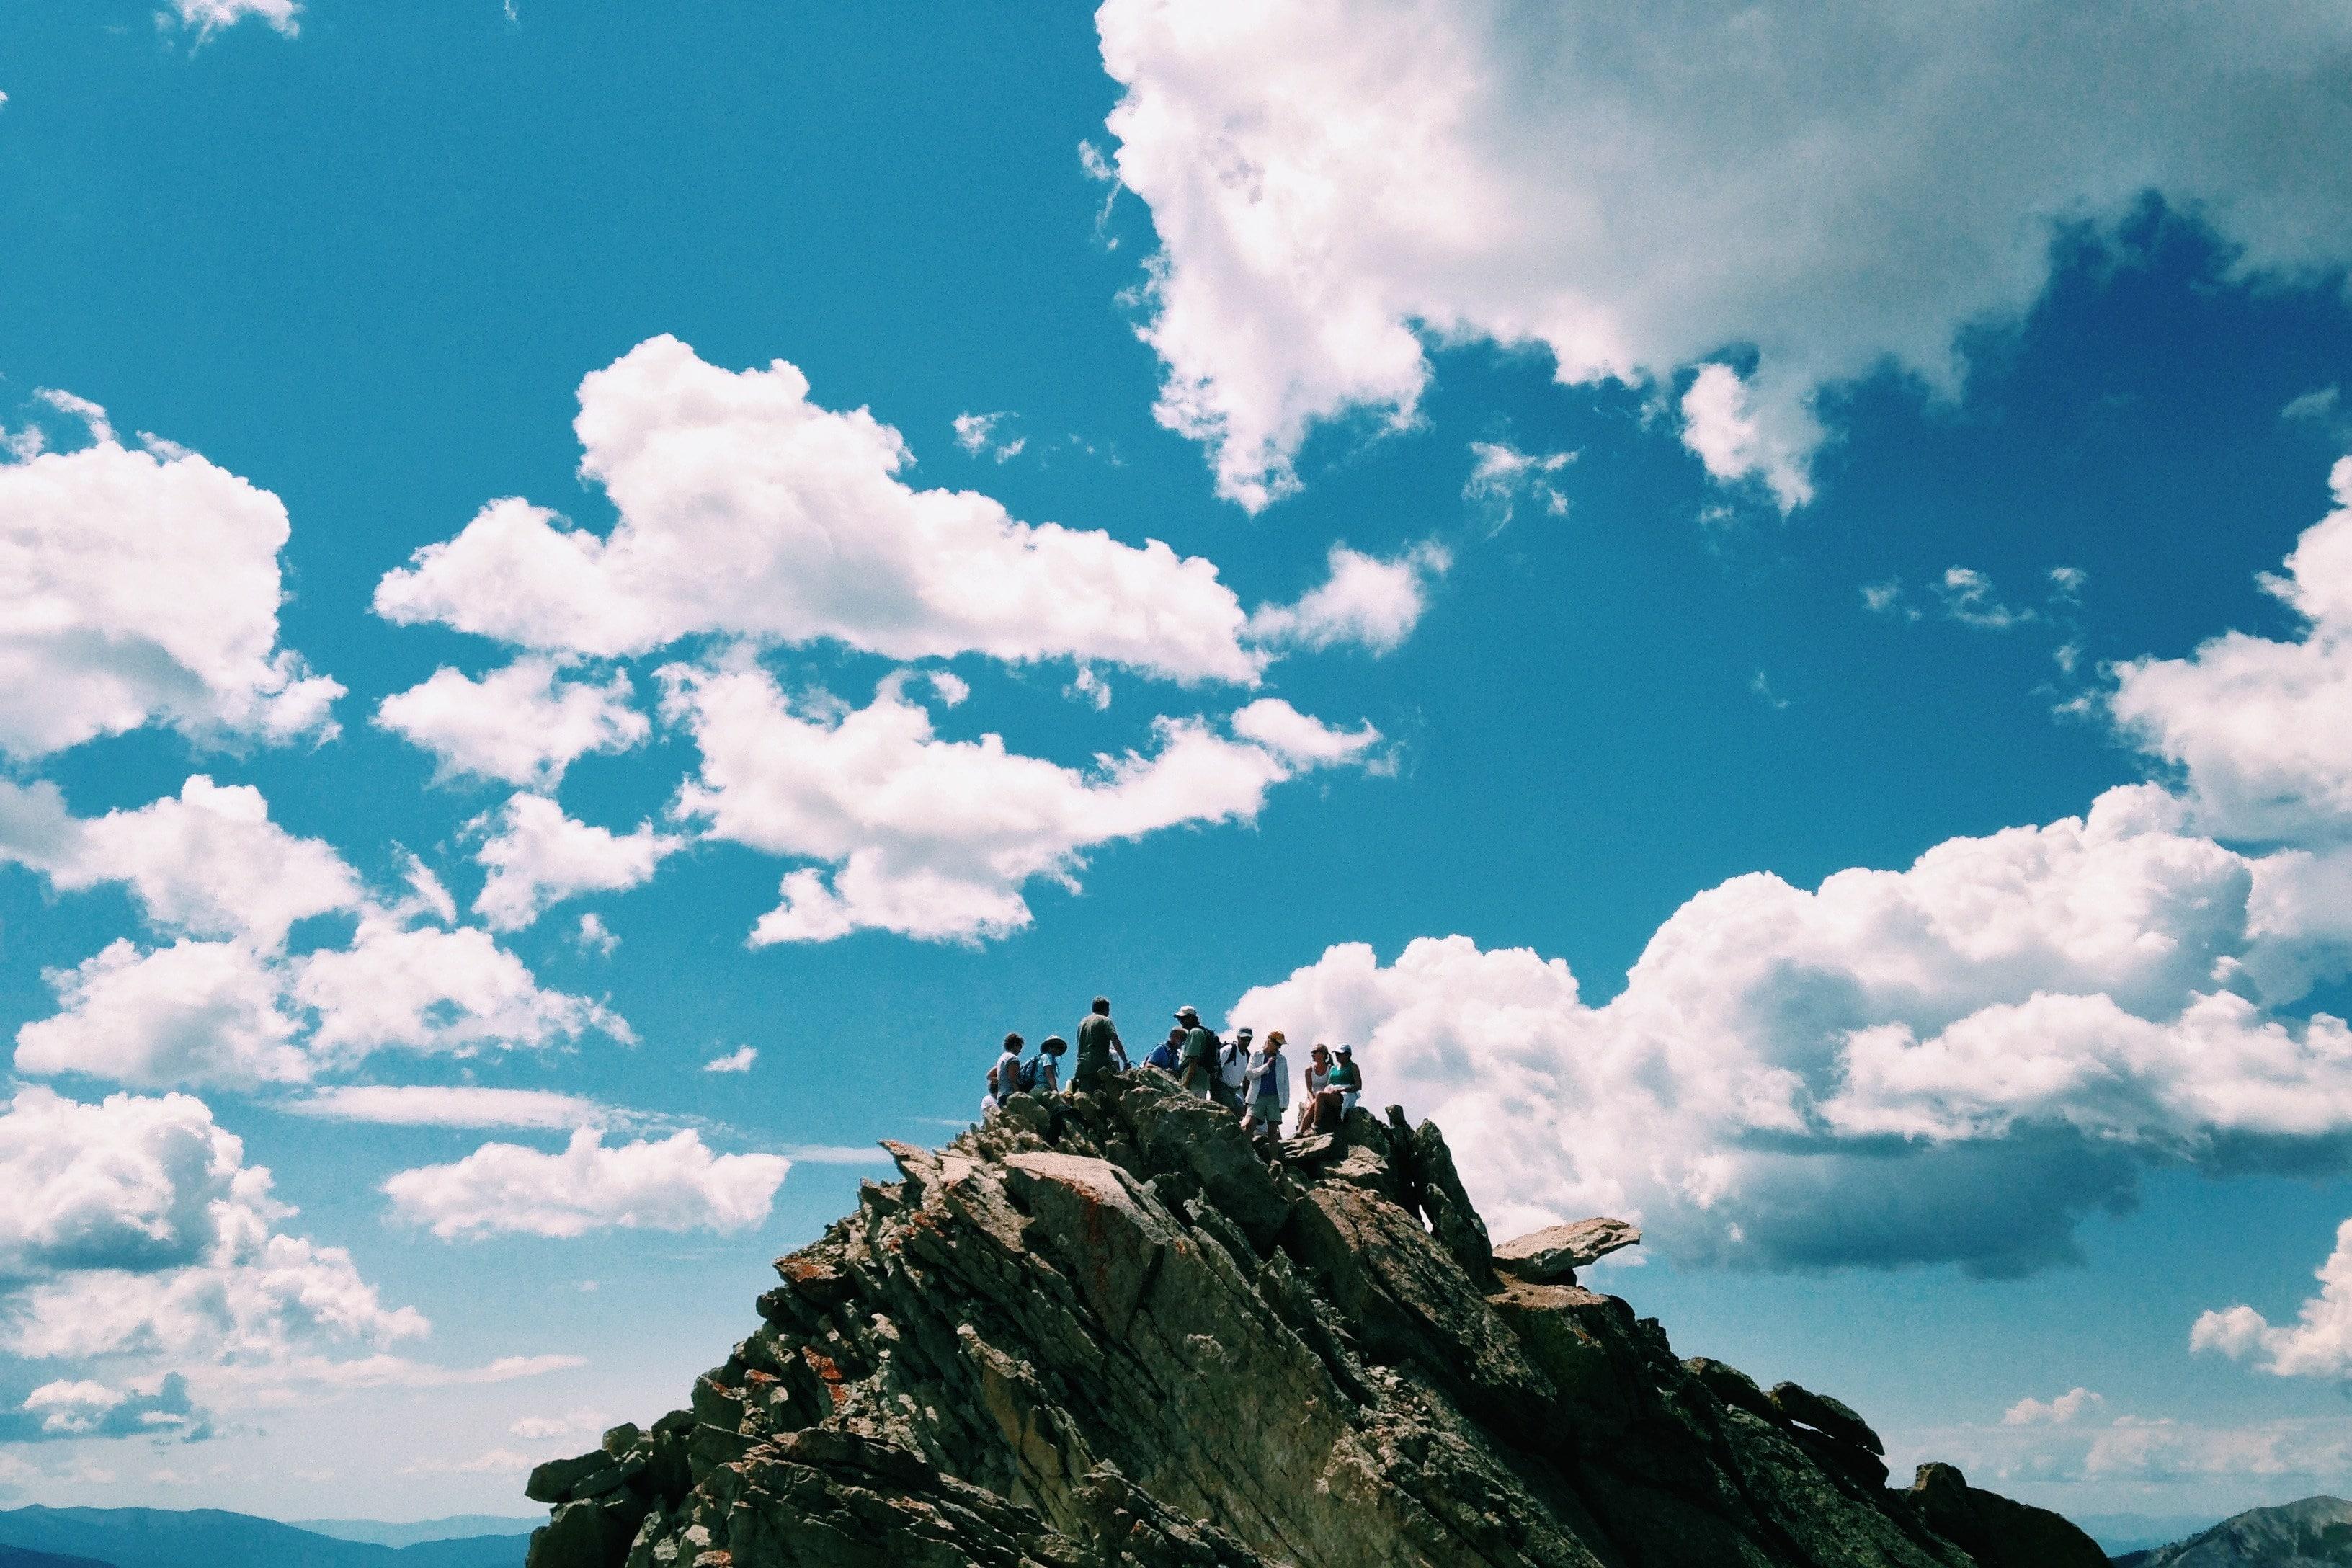 Group Gathering on Rocks